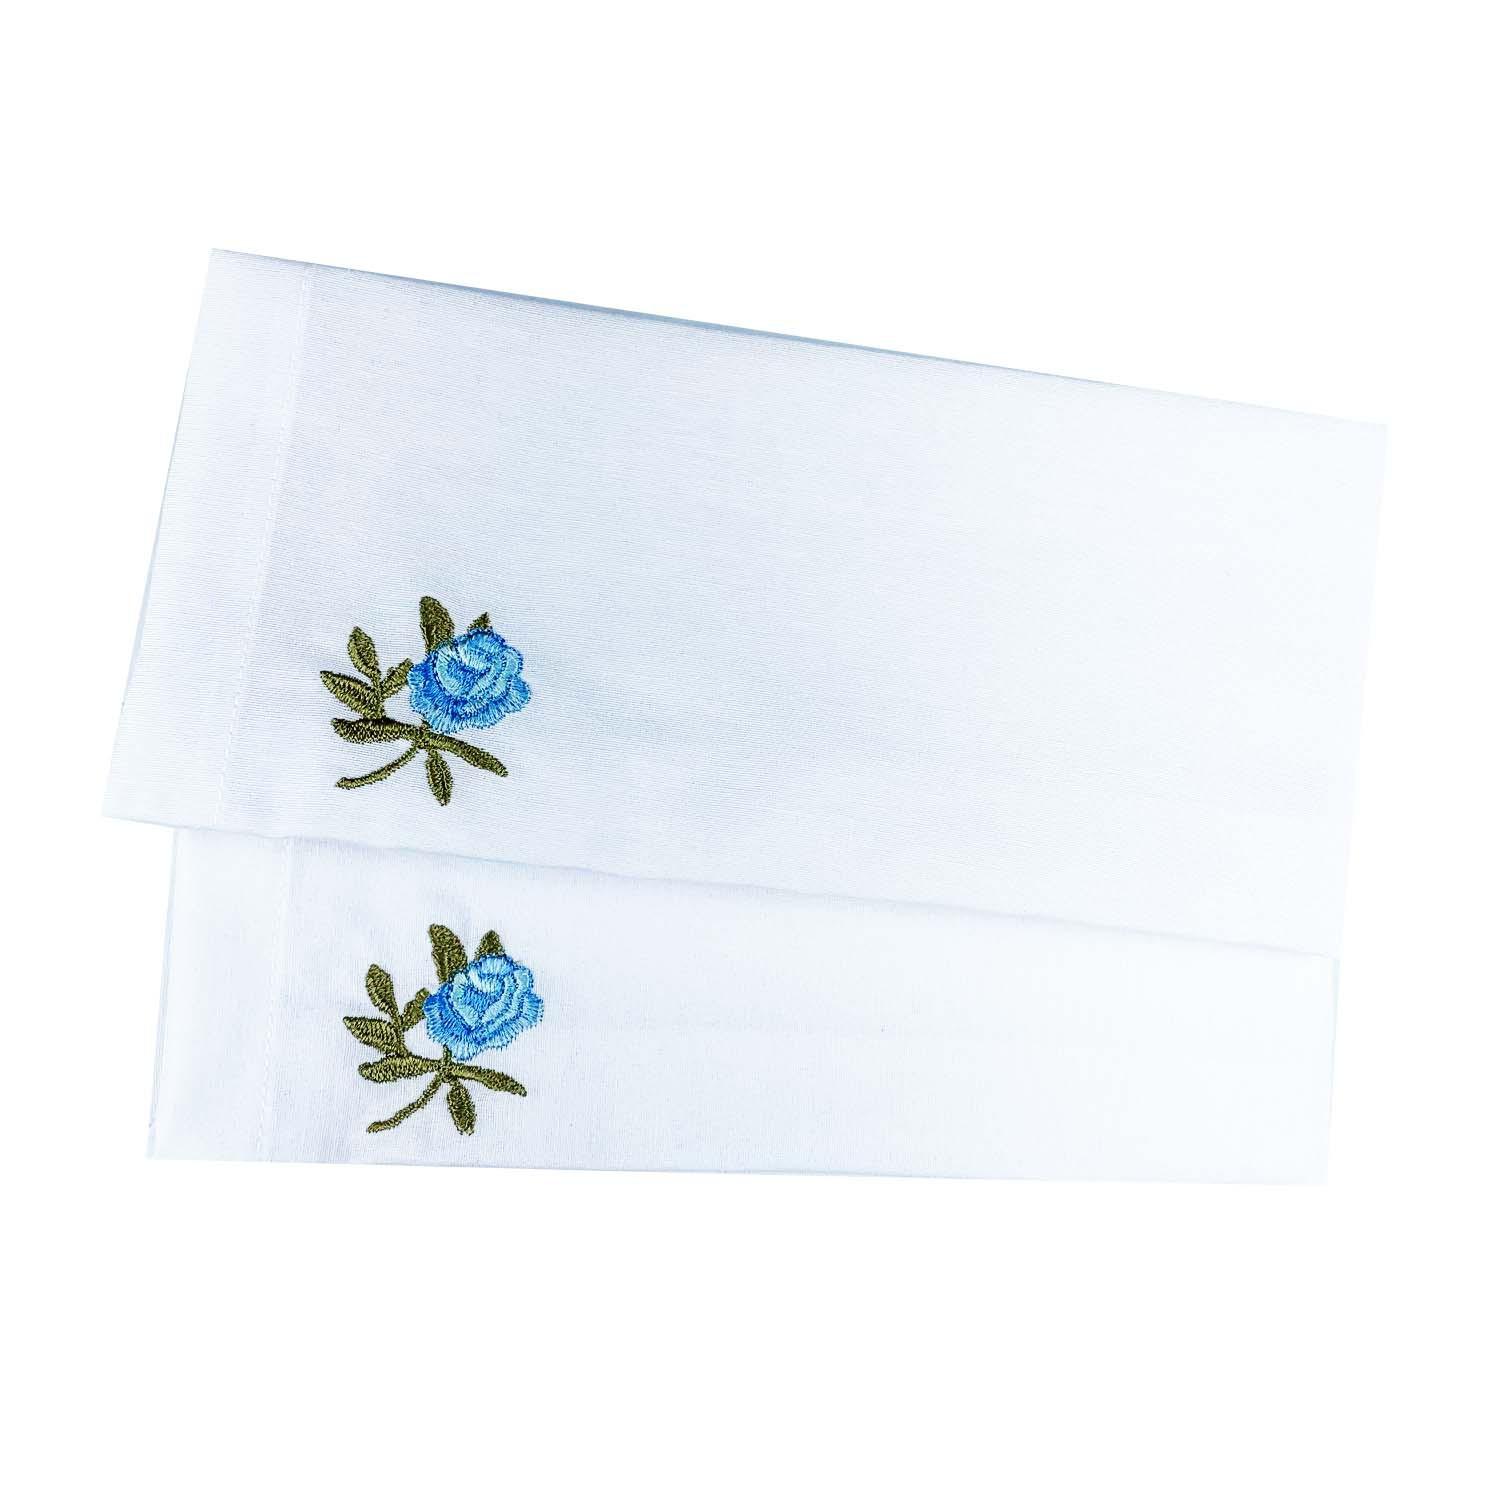 Jogo c/ 2 Guardanapos Branco Bordado Flor Azul